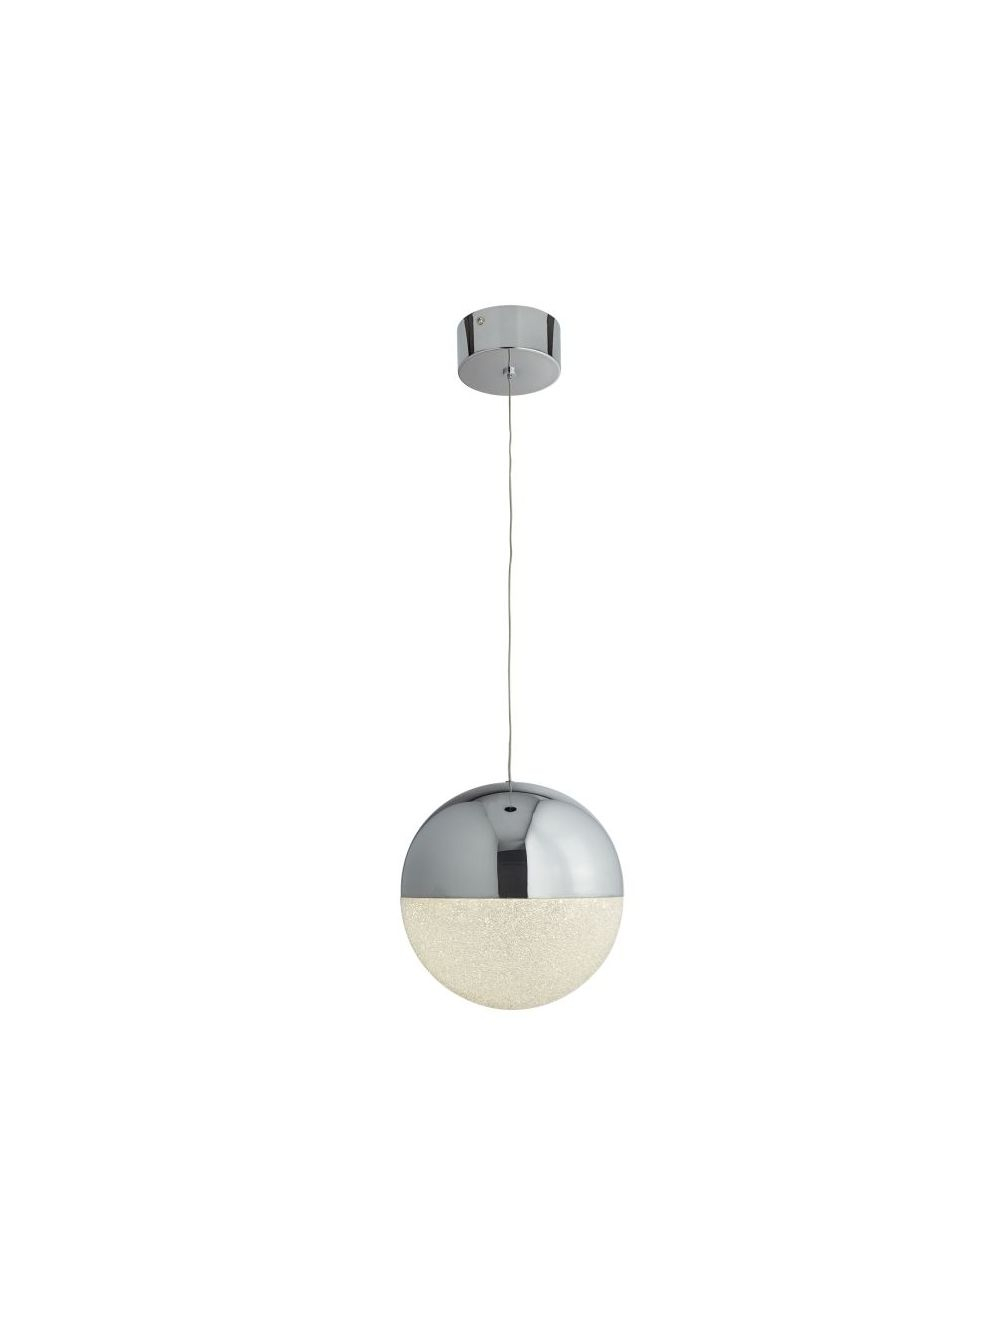 1 Light Led Globe Pendant Ice Shade Chrome With 1 Light Globe Pendants (View 2 of 30)